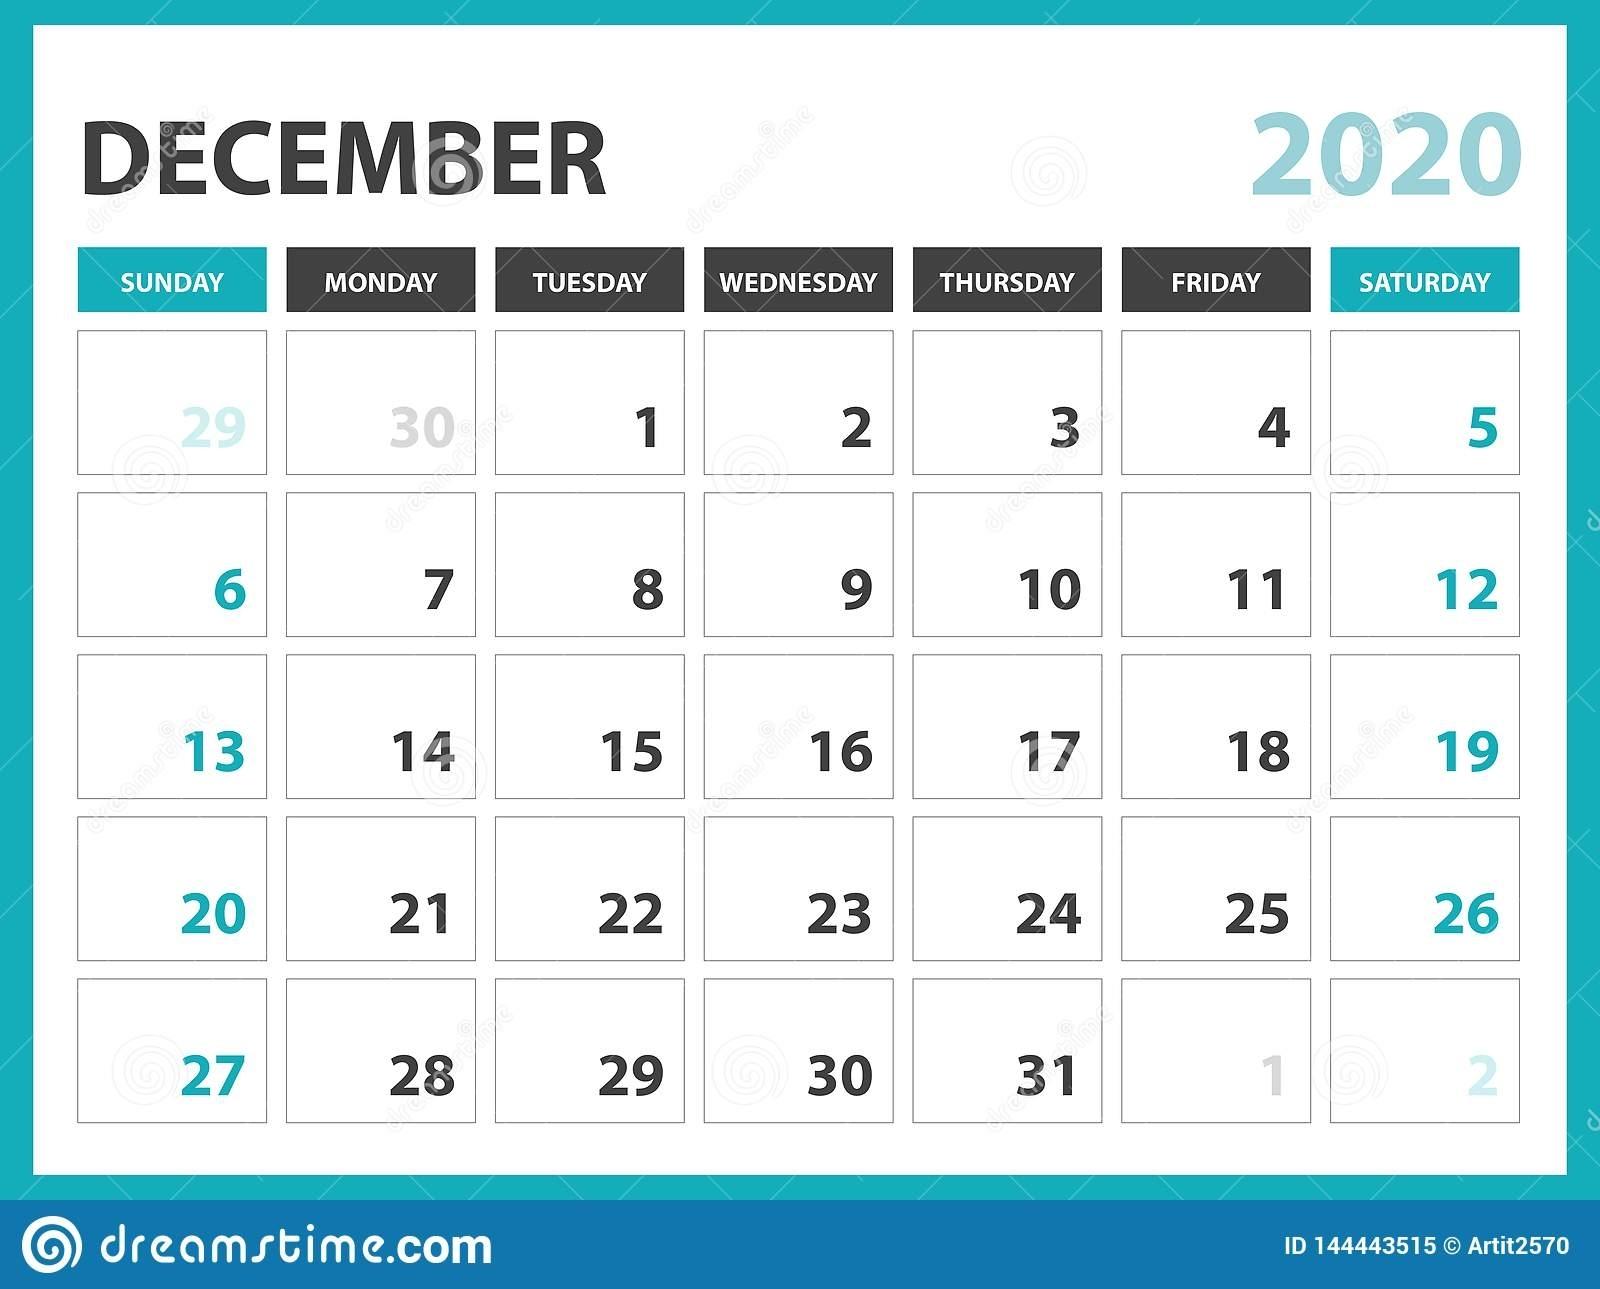 Desk Calendar Layout Size 8 X 6 Inch, December 2020 Calendar intended for Calendar Template Monday To Sunday